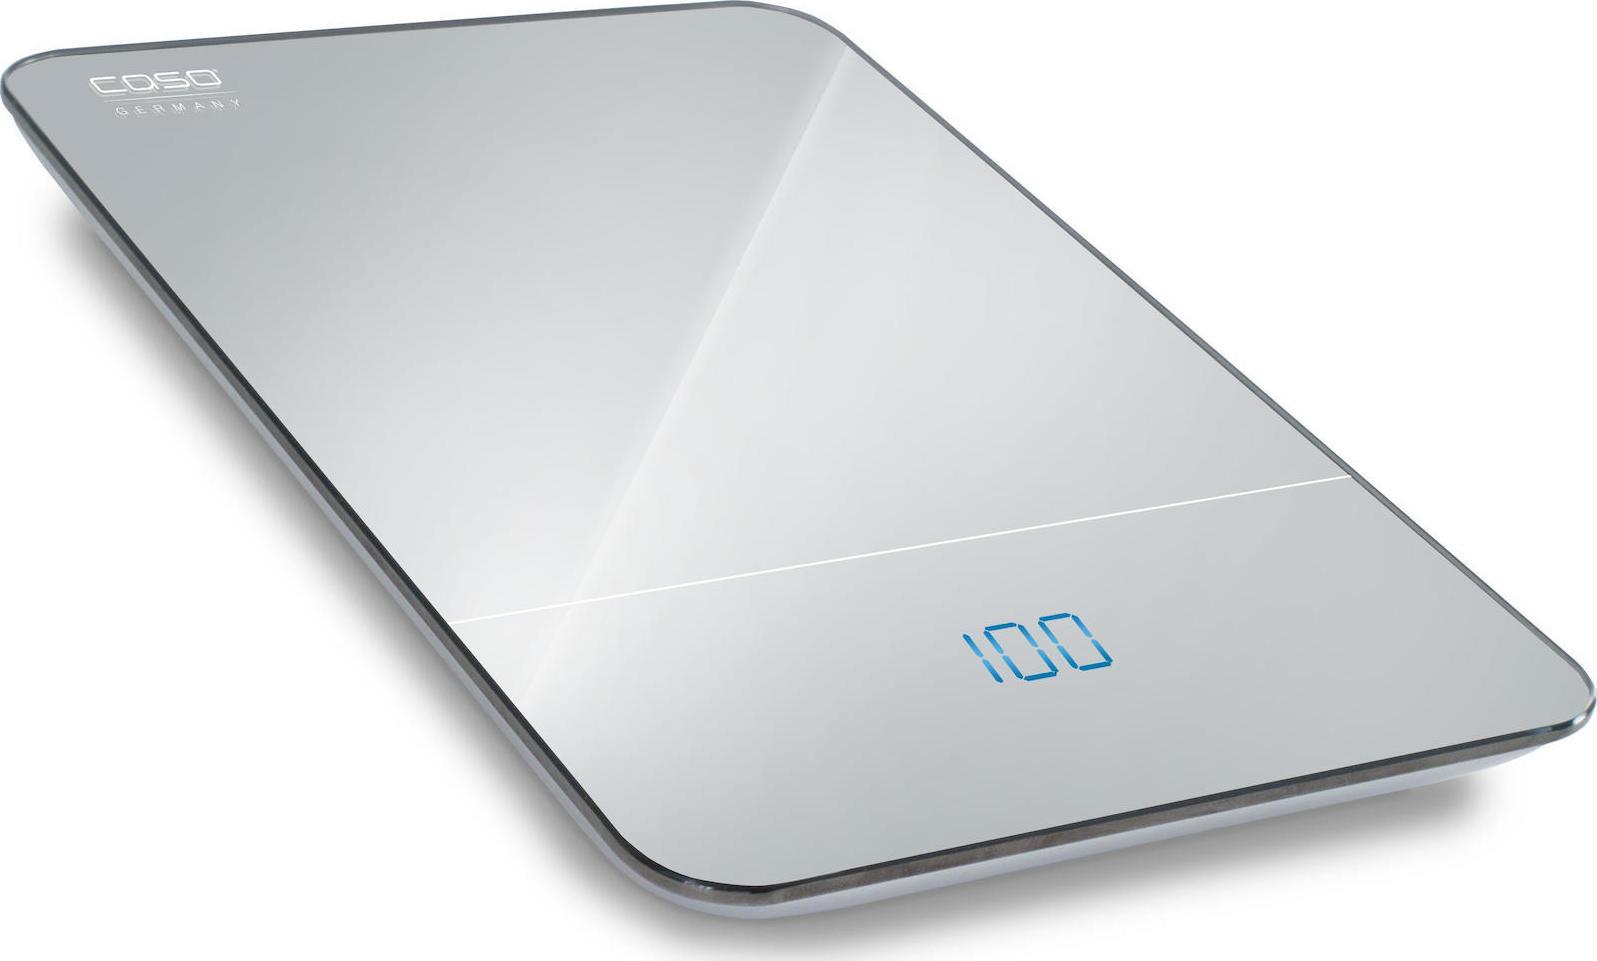 Caso F 10 Ψηφιακή Ζυγαριά Κουζίνας 10kg (3260) - Πληρωμή και σε έως 36 Δόσεις!!!